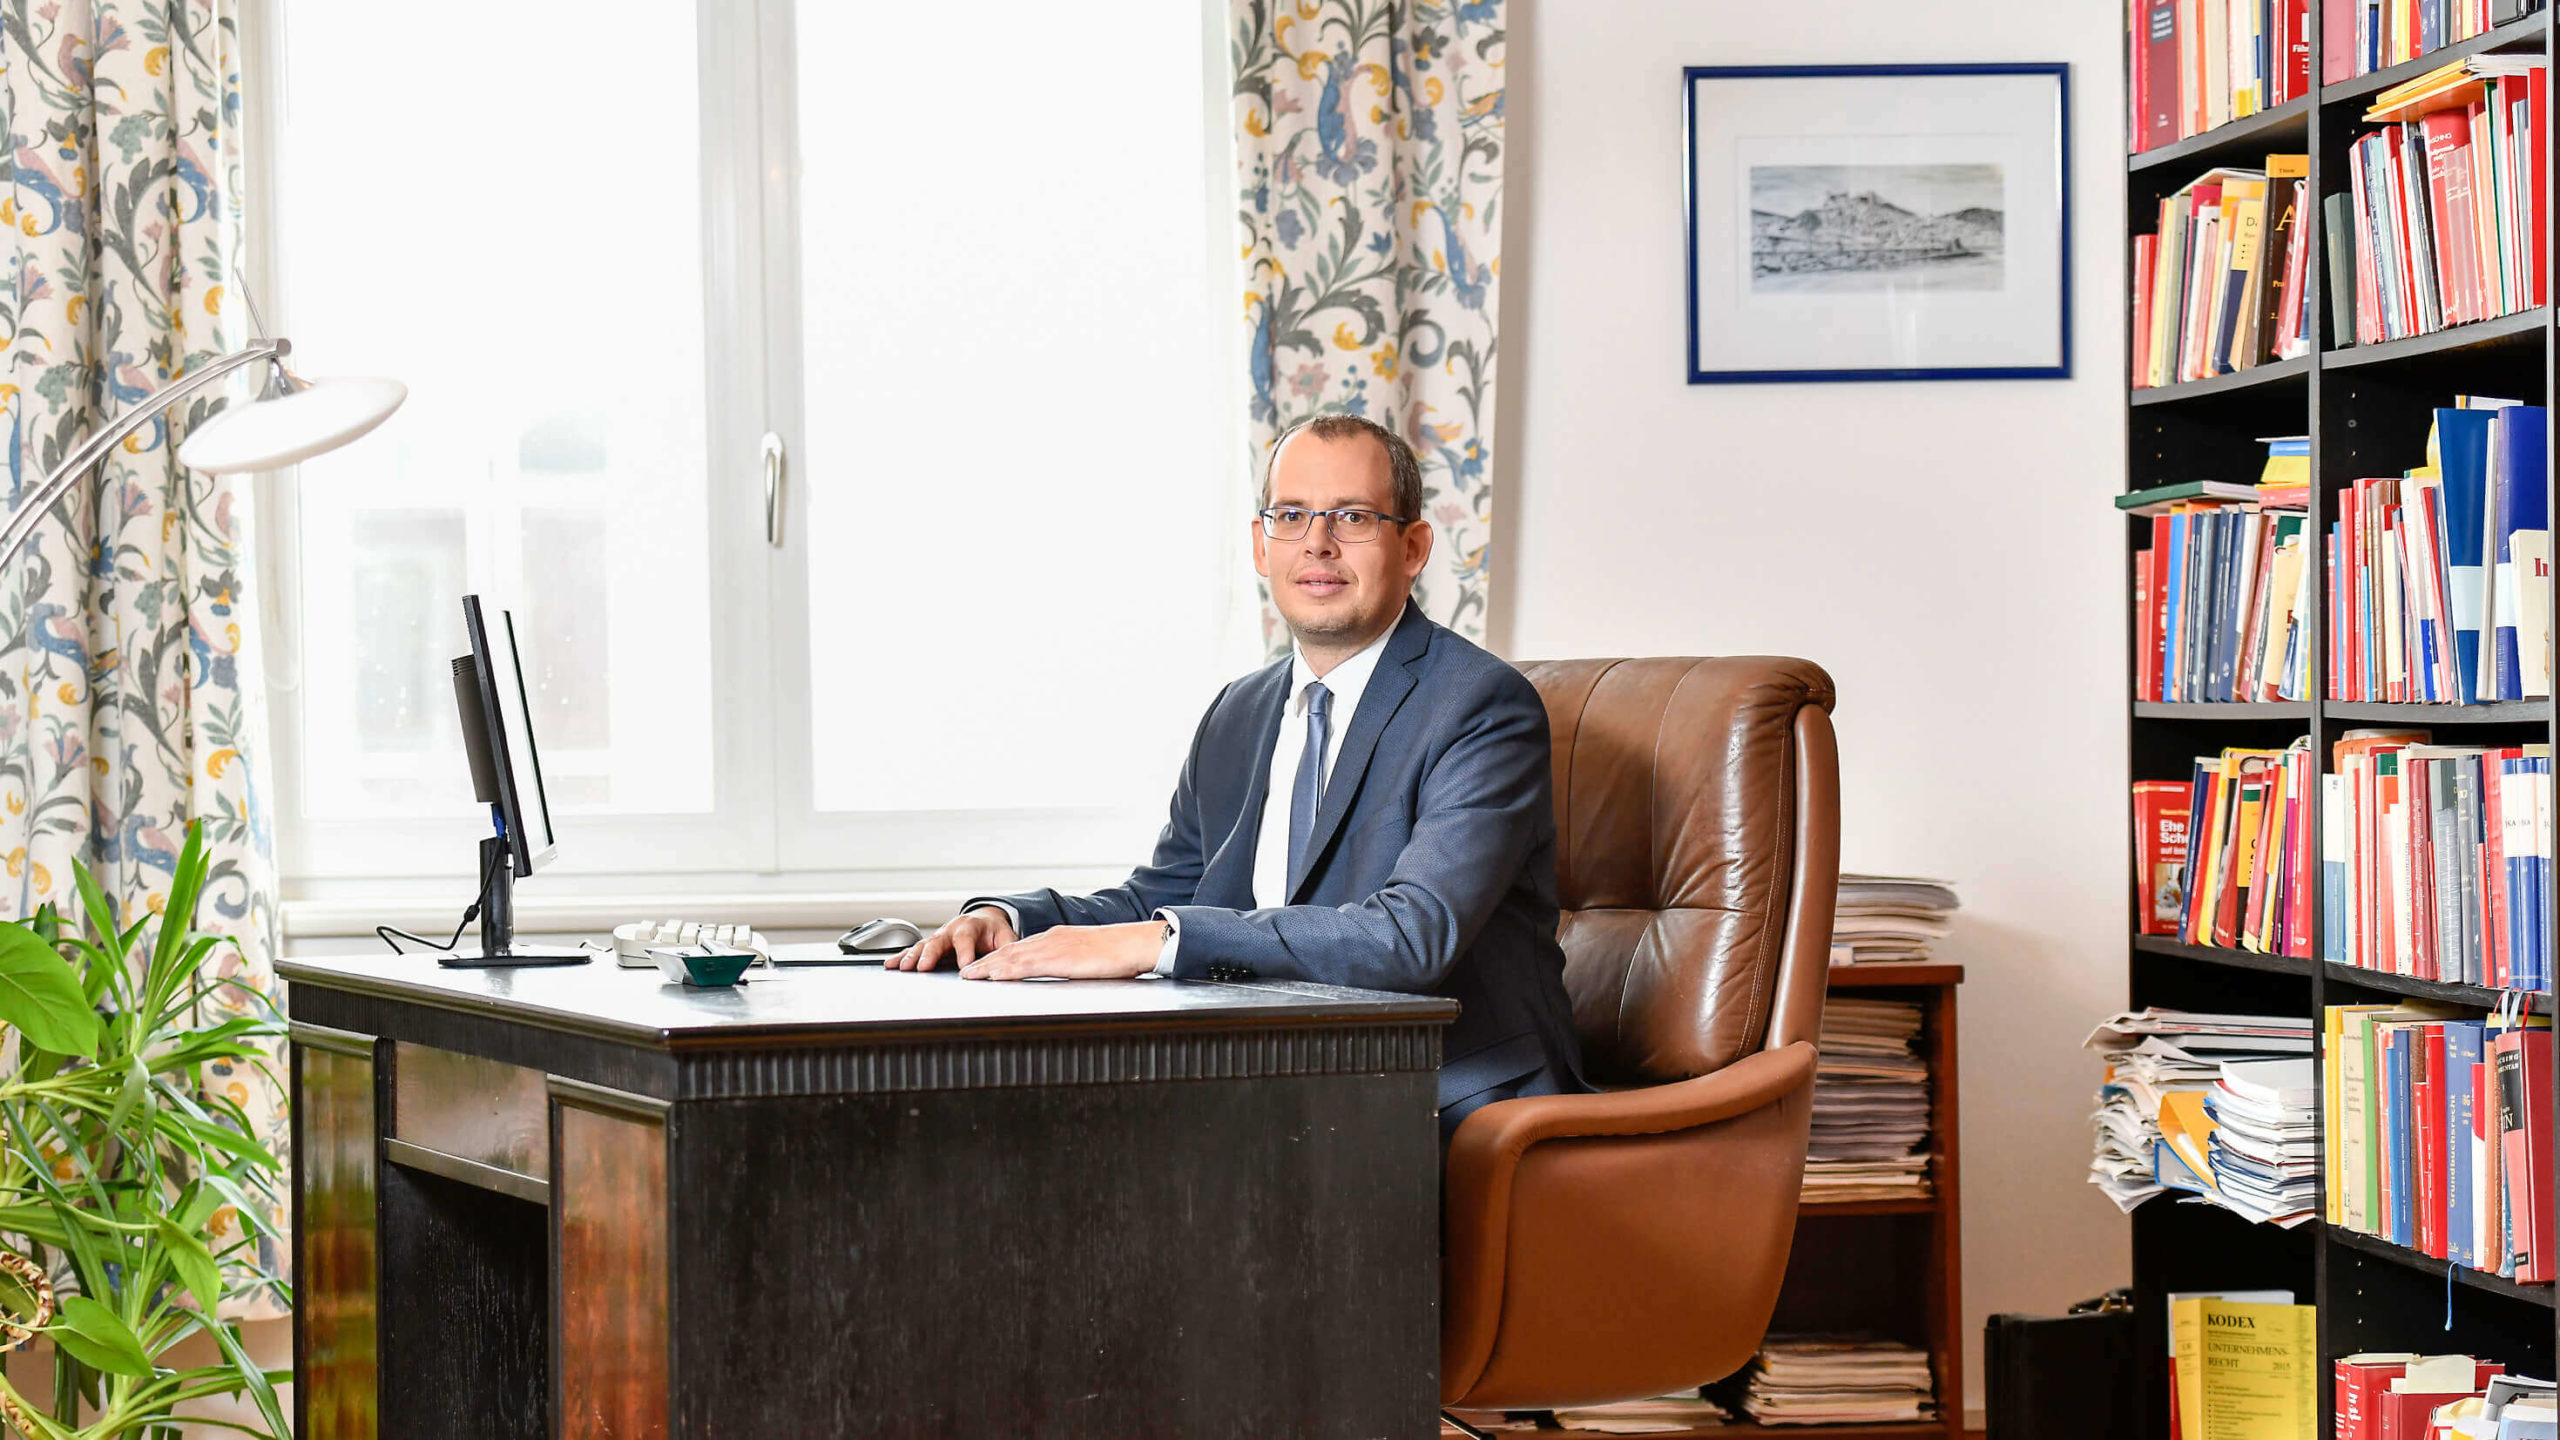 Anwalt beim Arbeitsplatz - Mag. Timo Ruisinger - Rechtsanwalt in 3580 Horn